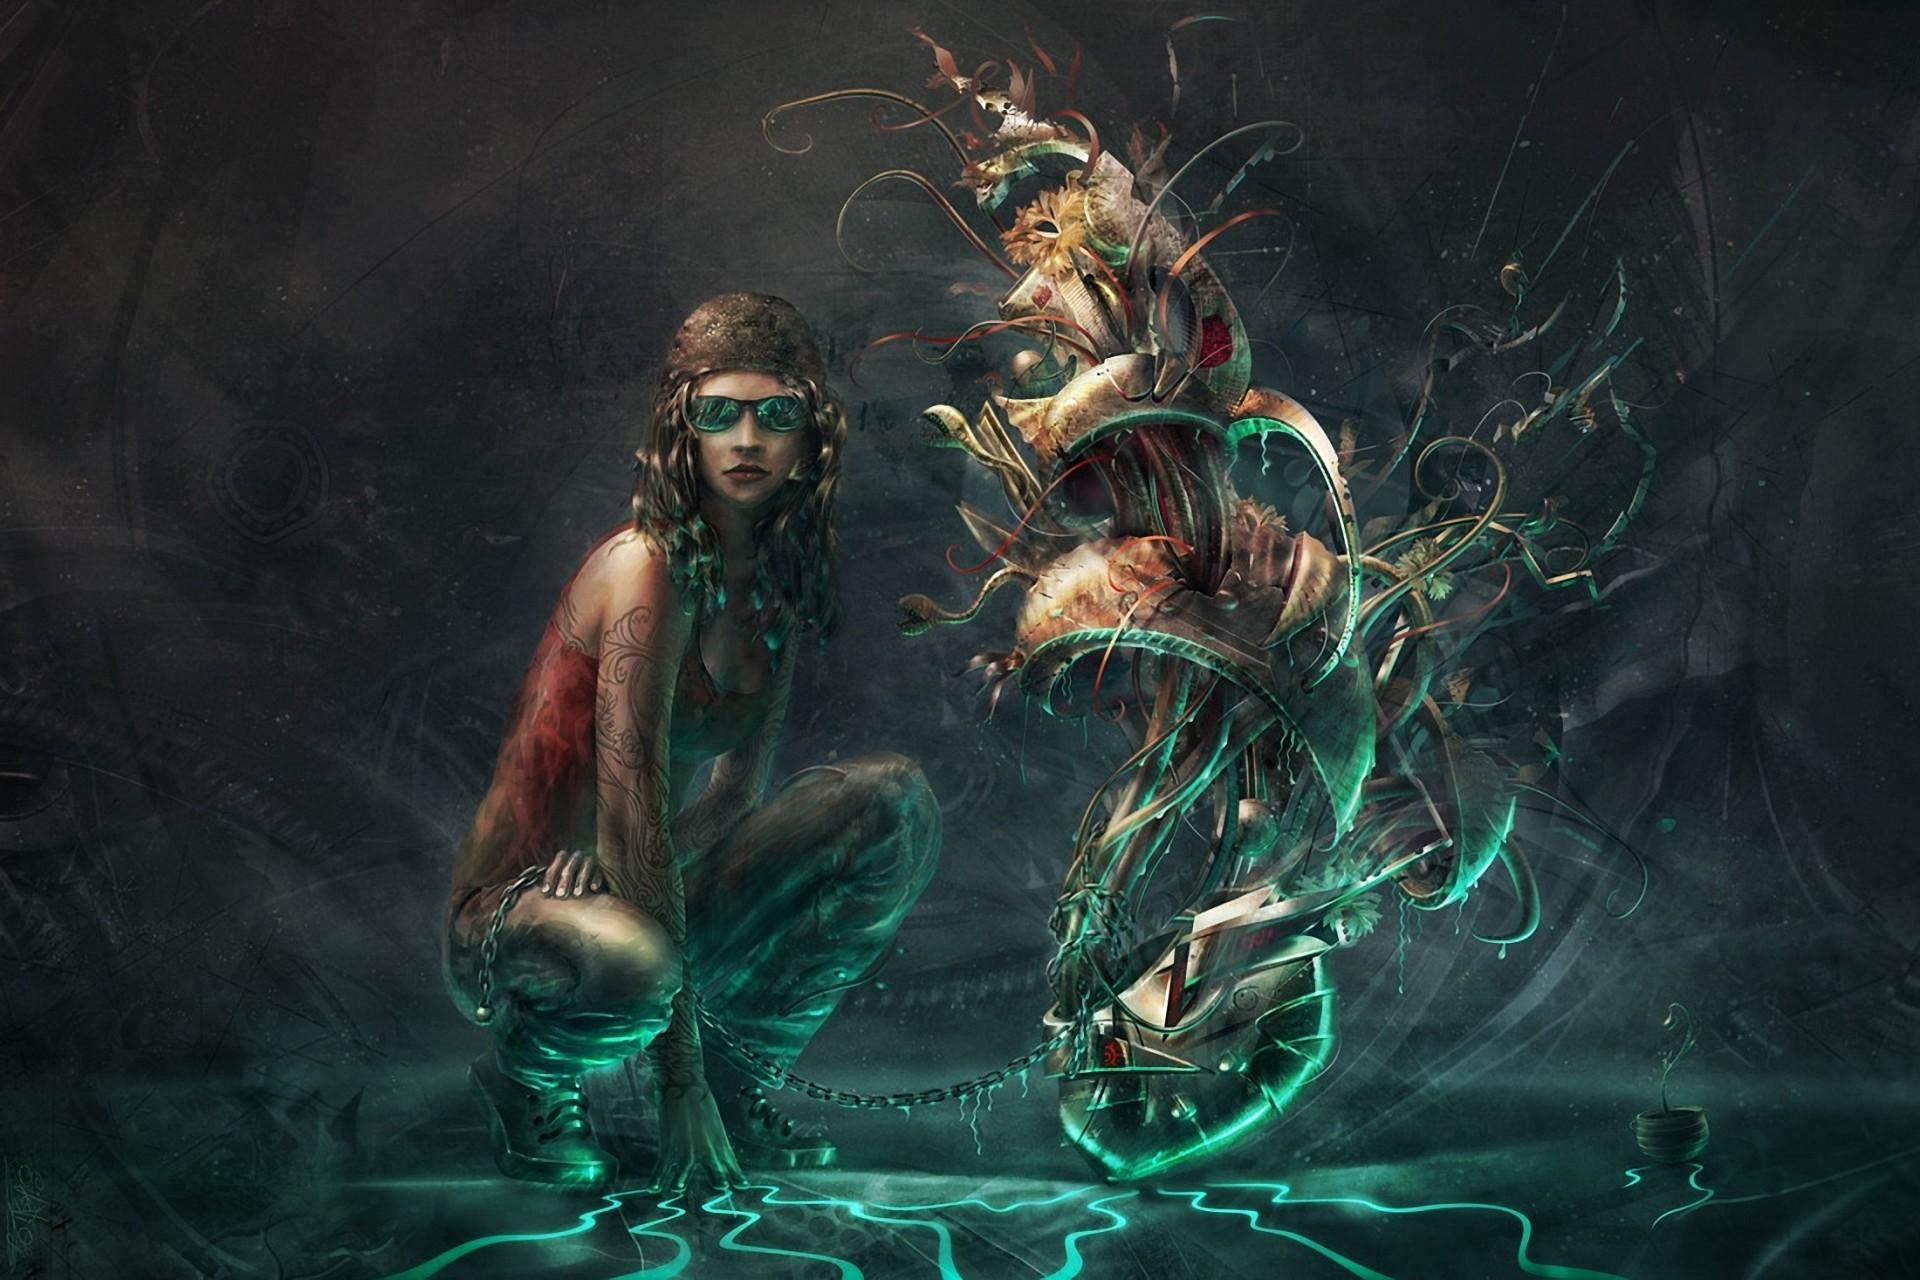 Dark Fantasy Art Women   High Quality Wallpapers Hd Free Dark Fantasy  Wallpaper